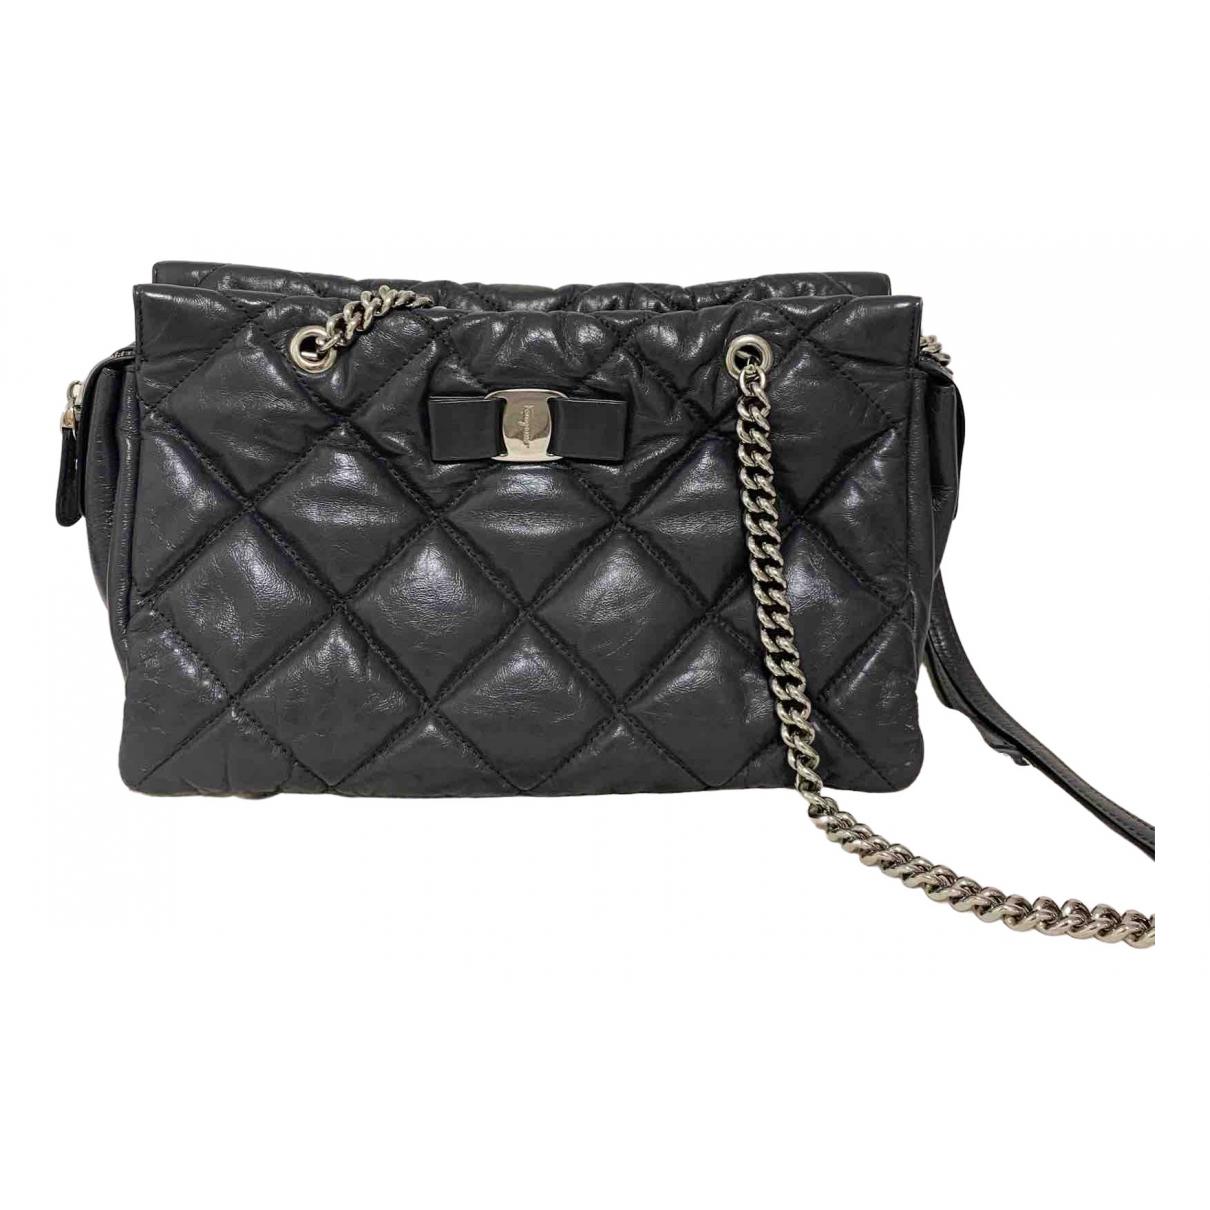 Salvatore Ferragamo Vara Grey Leather handbag for Women N